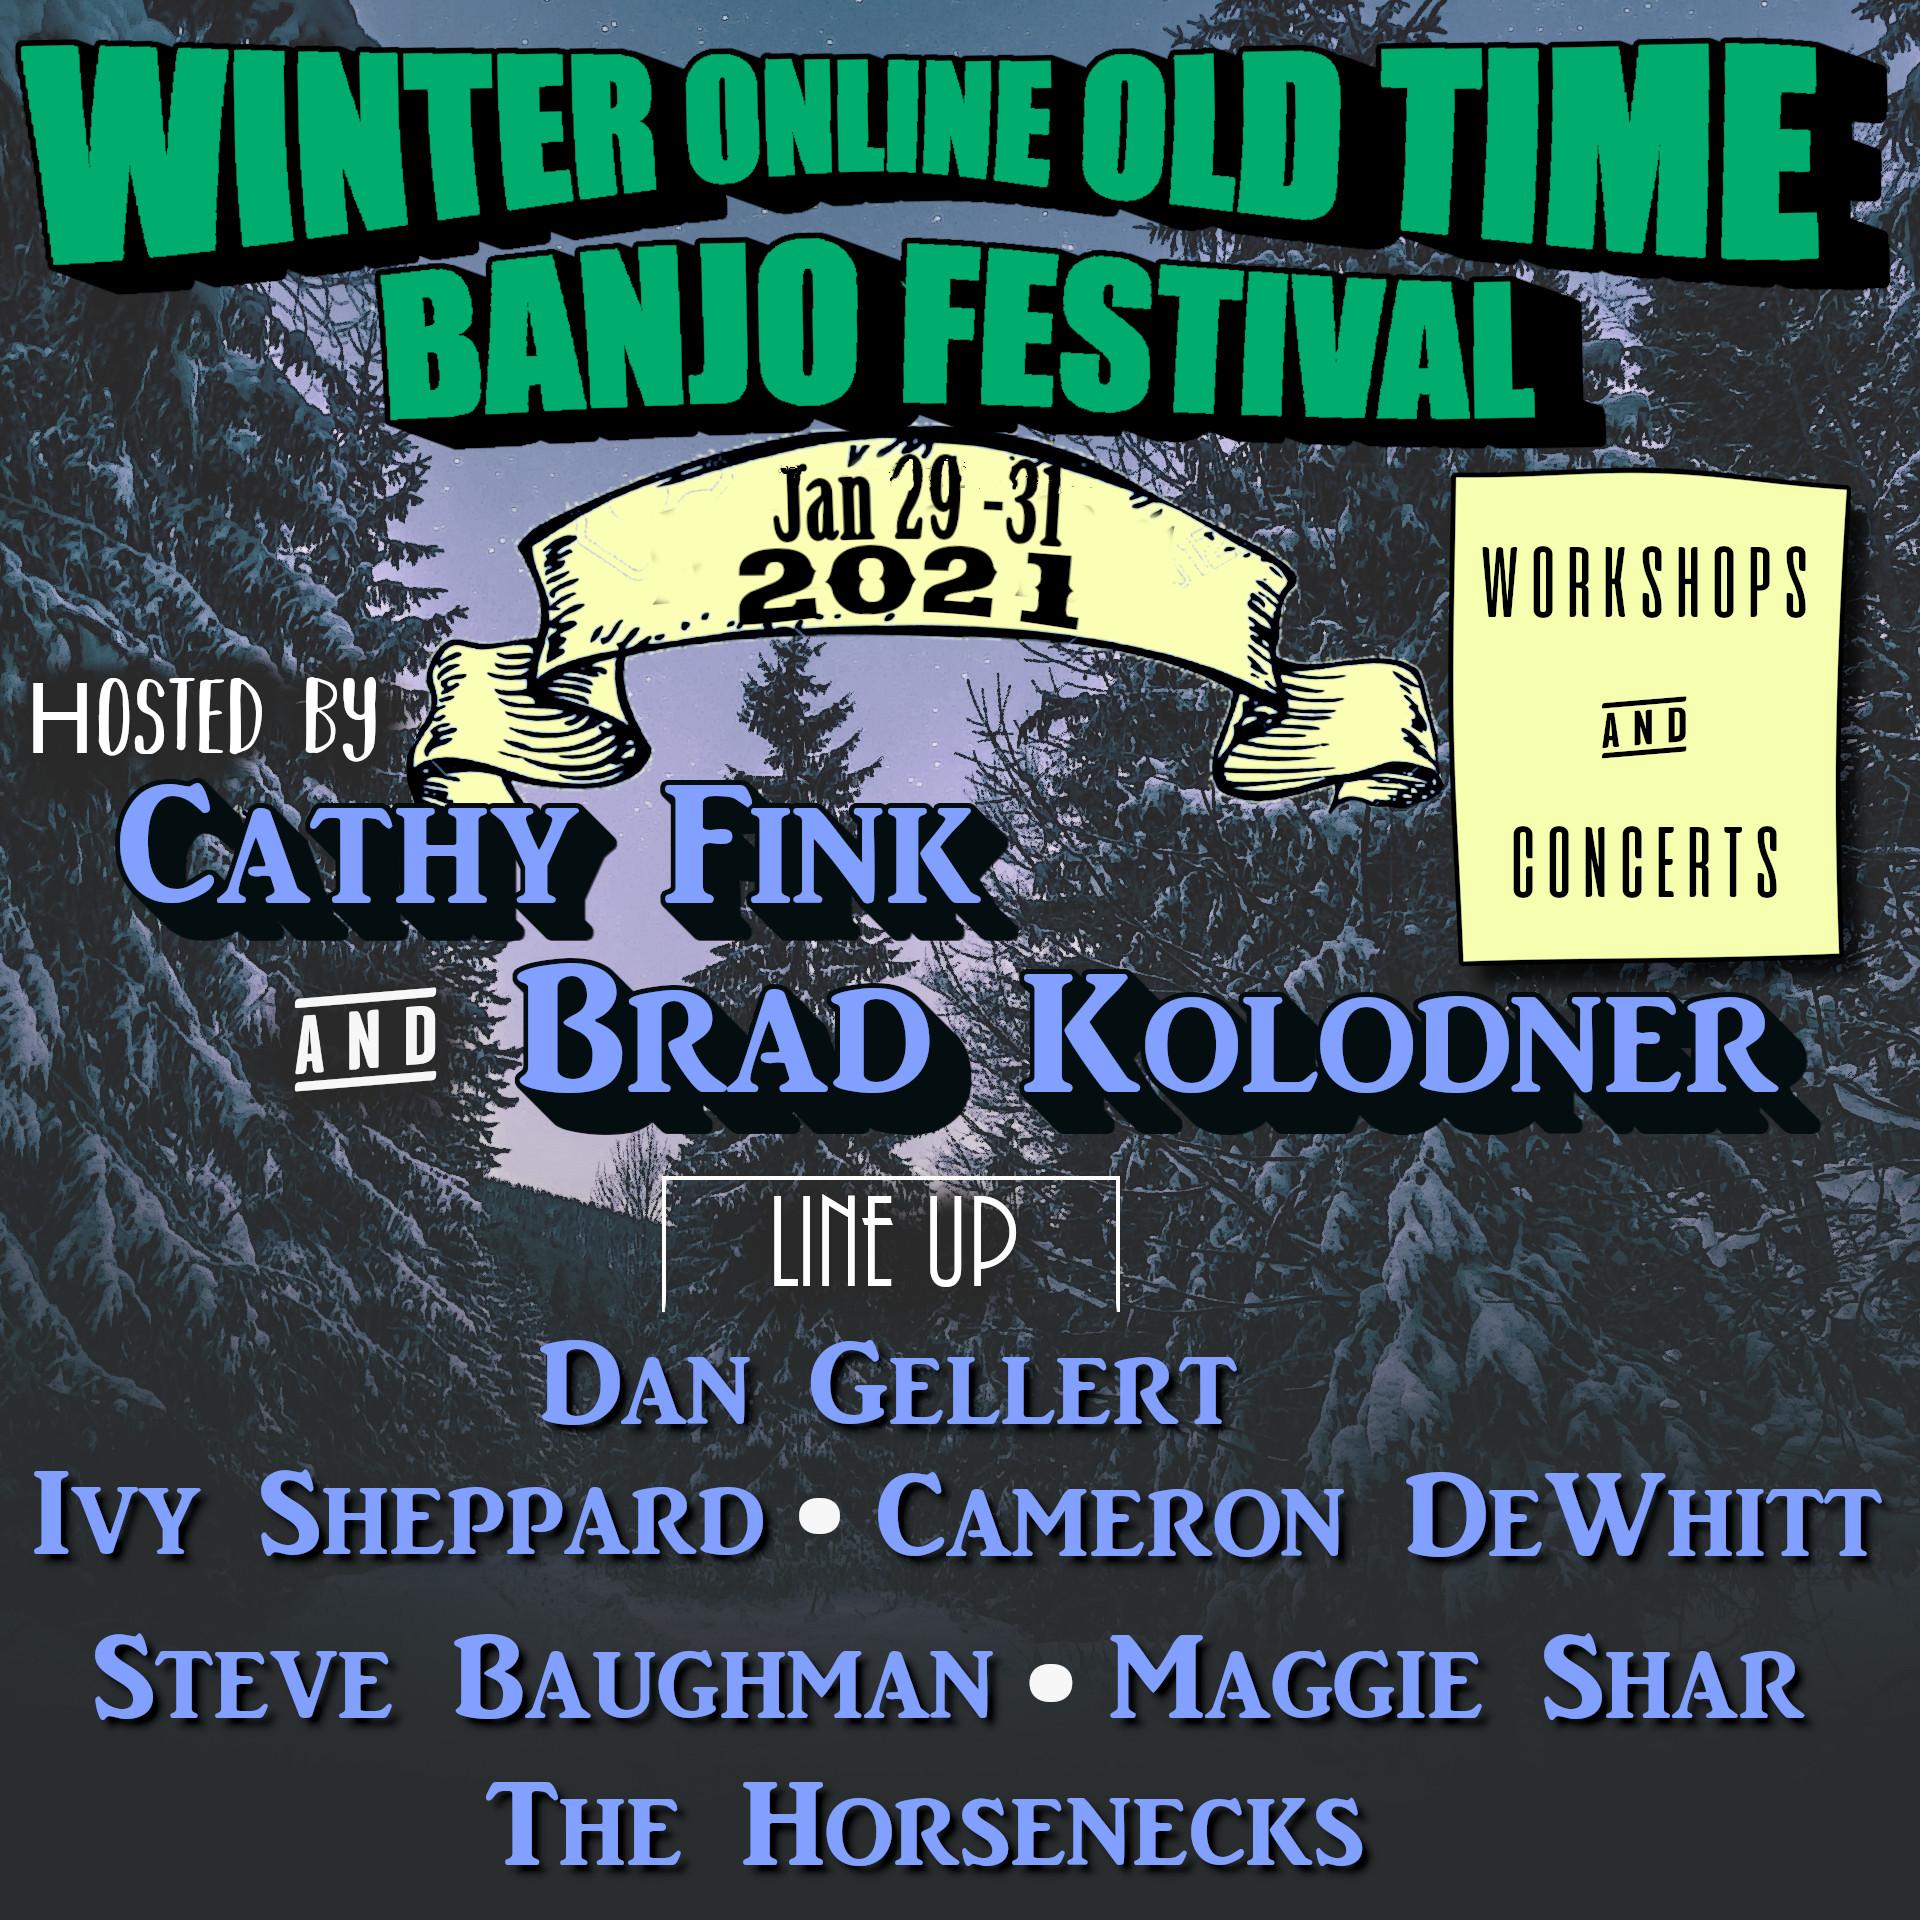 Winter Banjo Fest Square